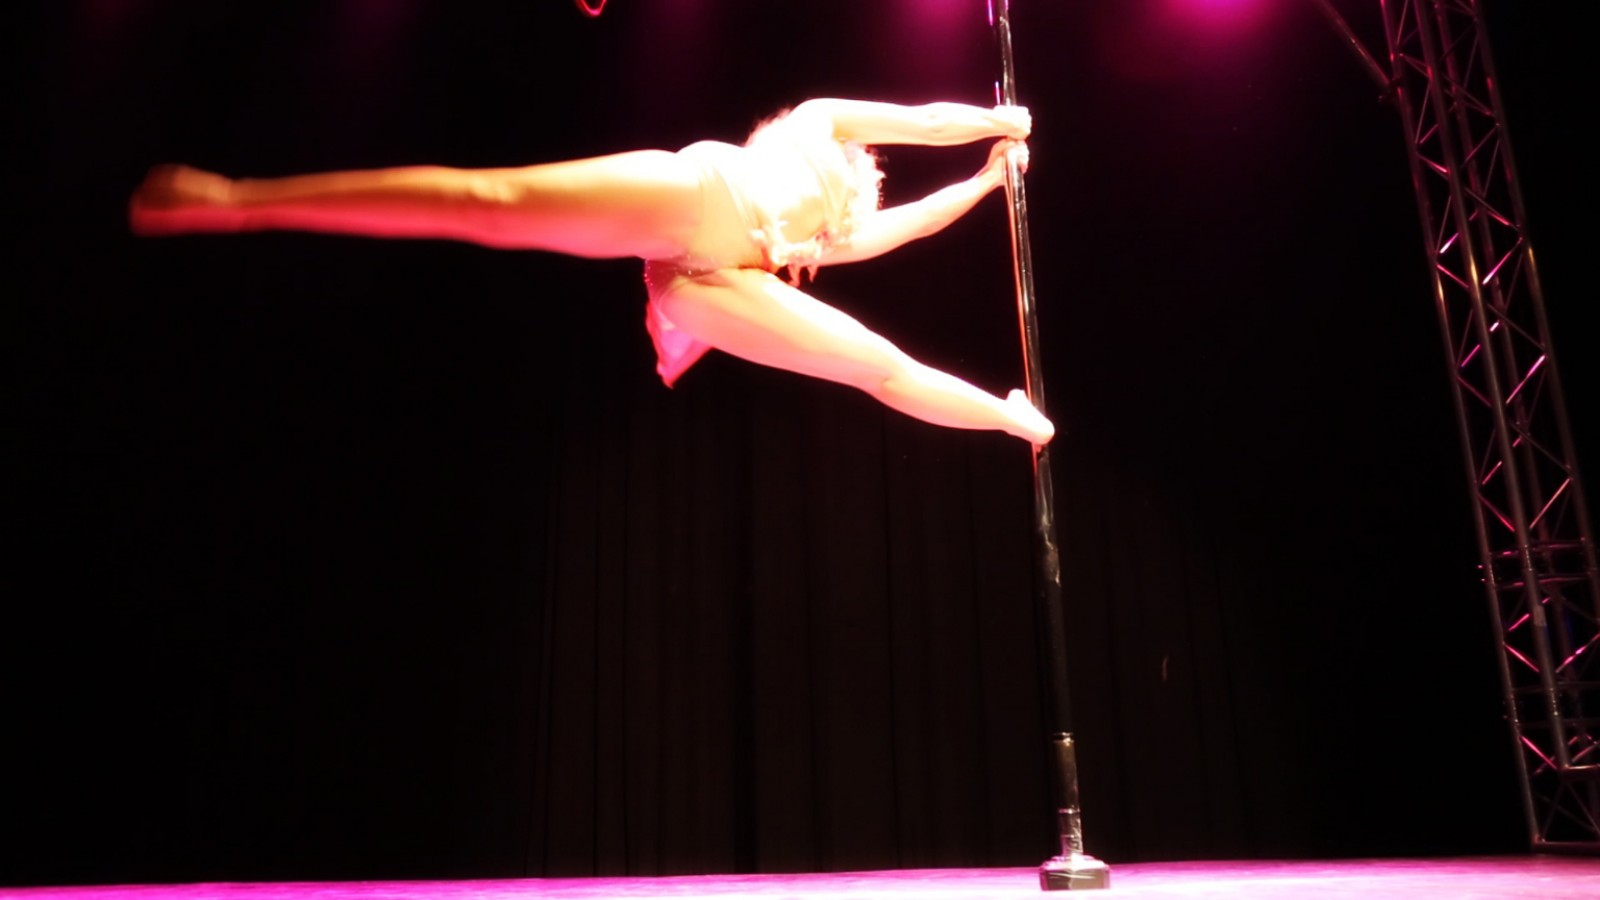 Aerial-Vidéo-Pole dance